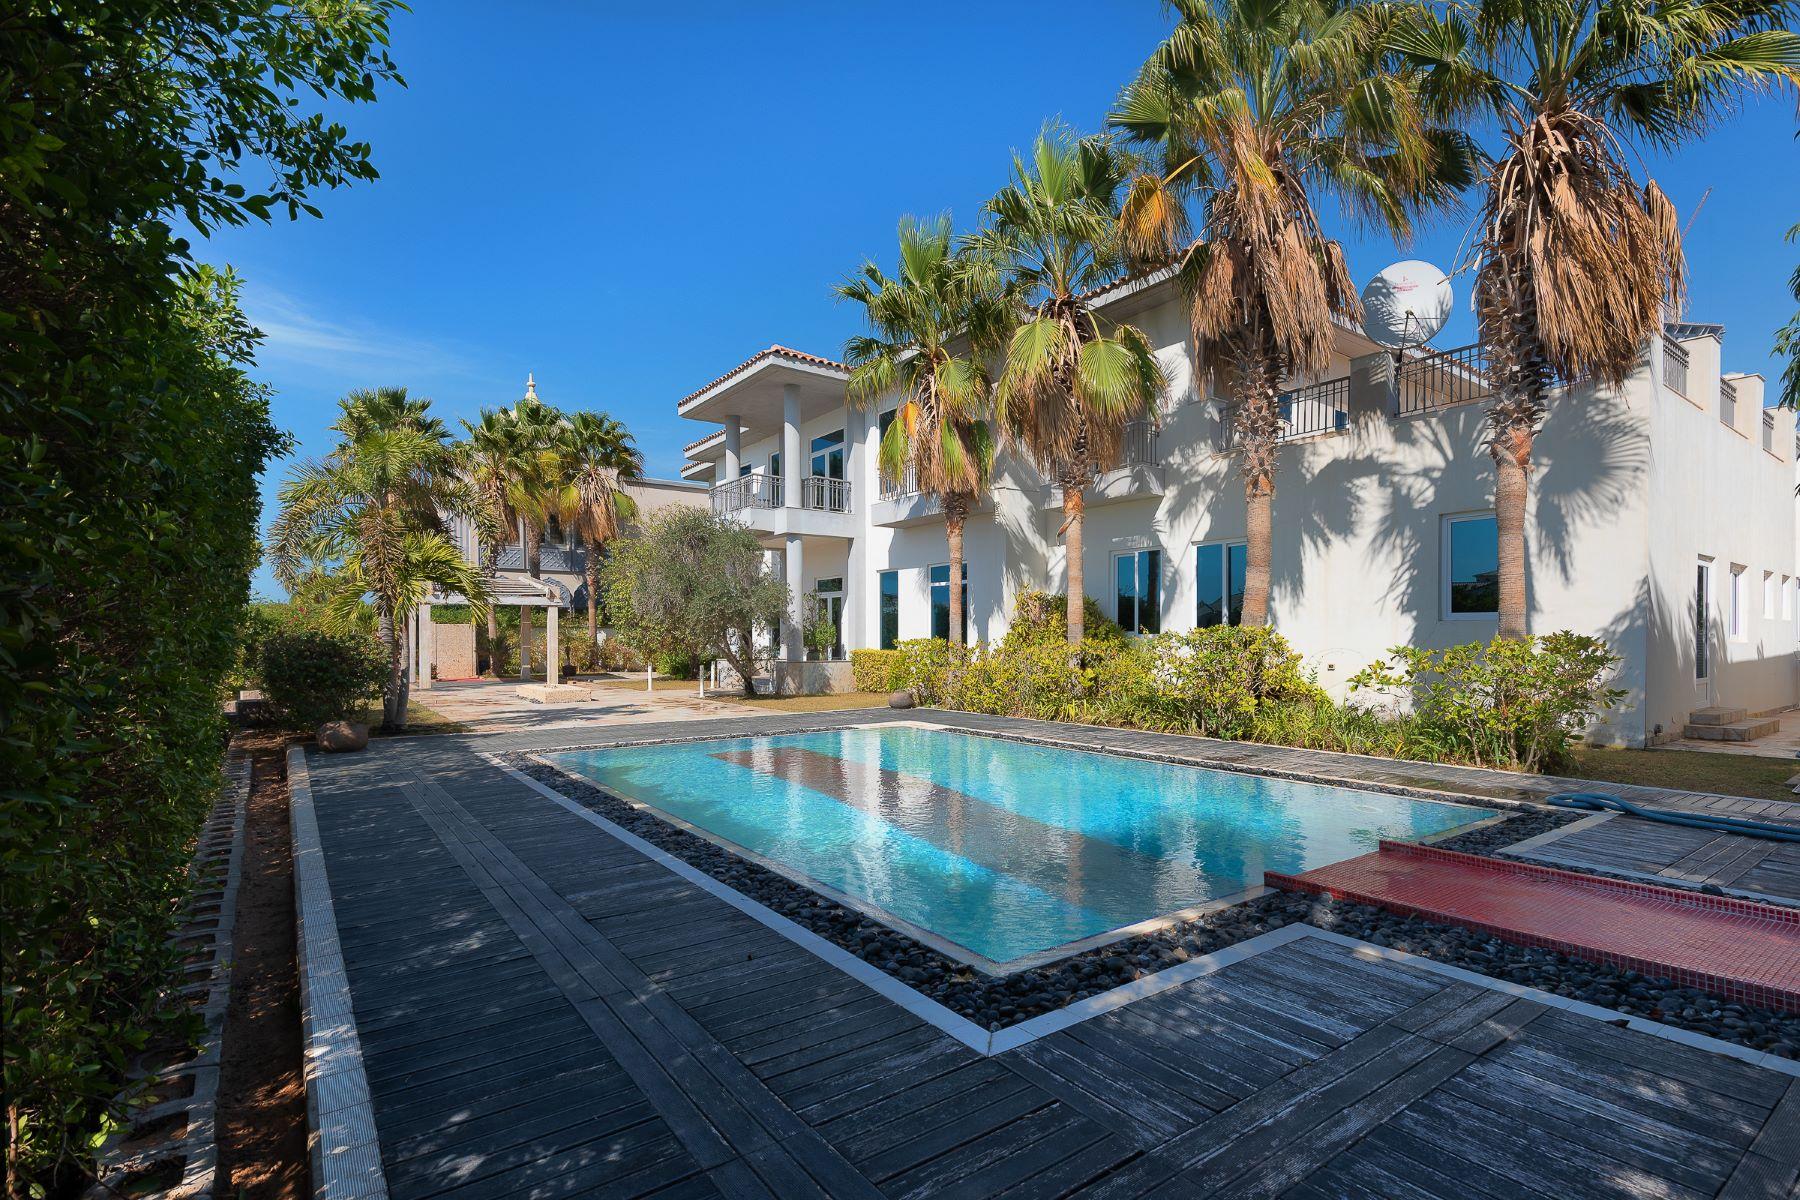 Property for Sale at Upgraded Mediterranean Signature Villa Dubai, Dubai United Arab Emirates